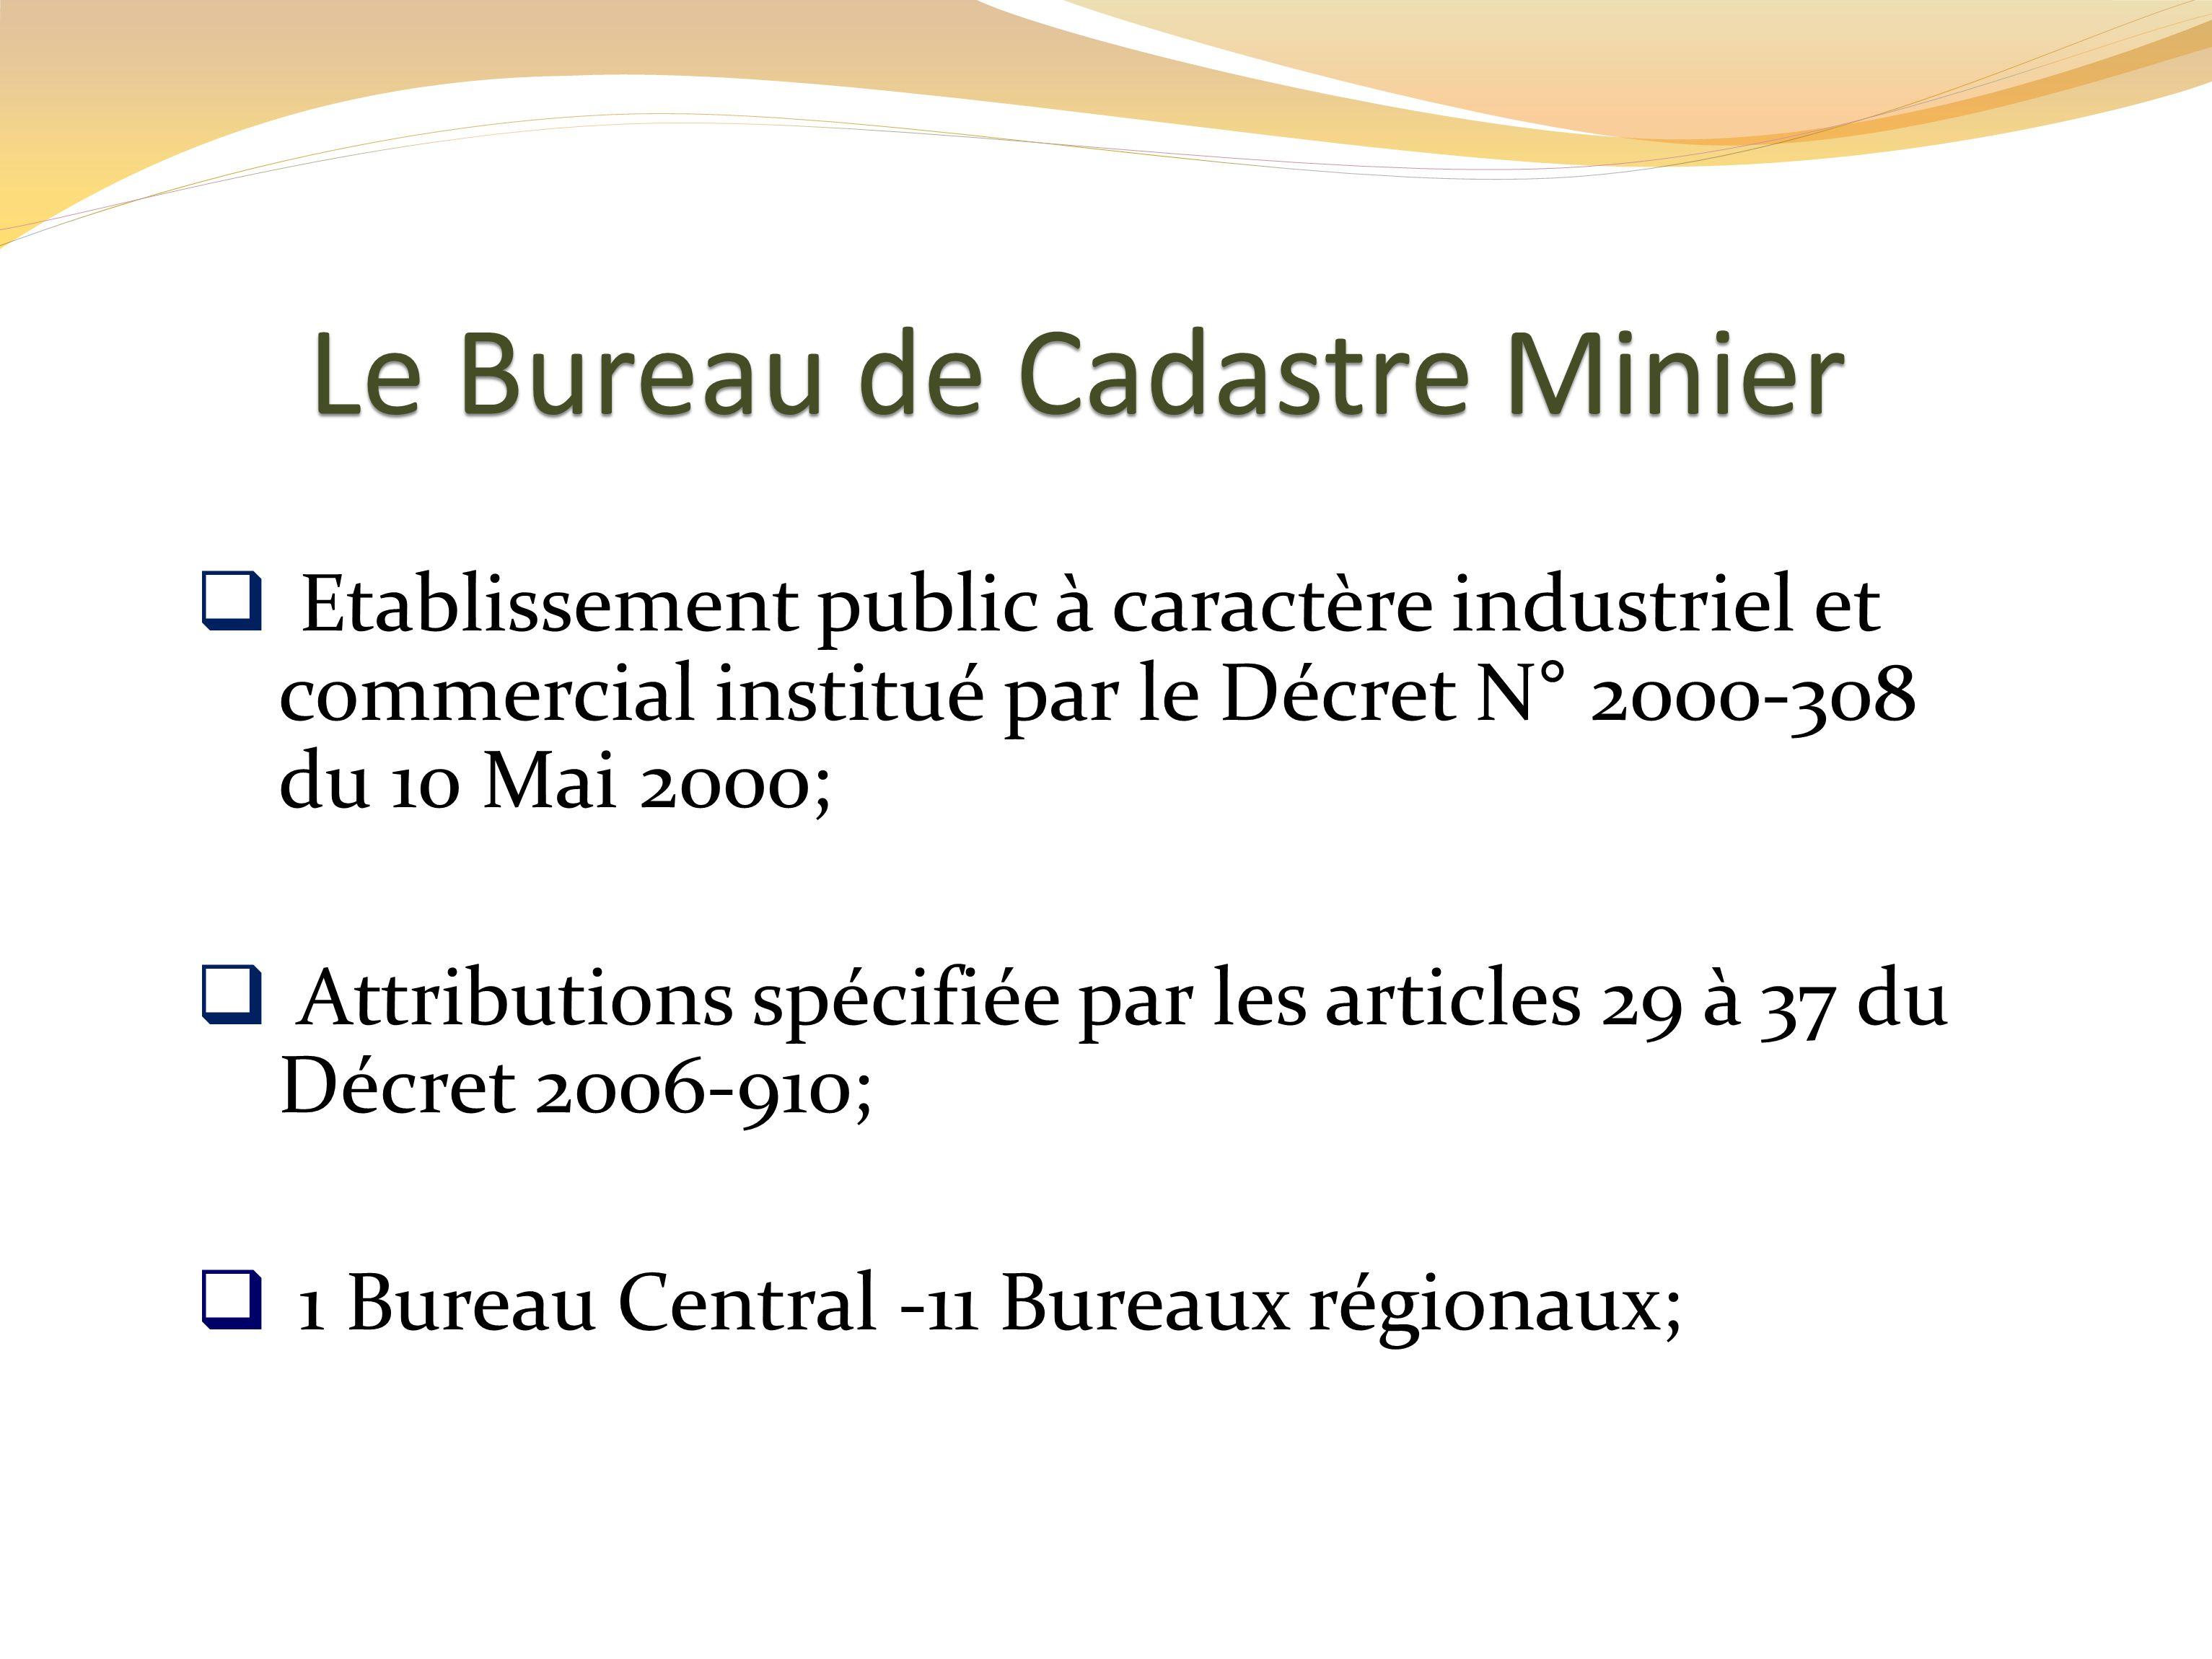 Le Bureau de Cadastre Minier